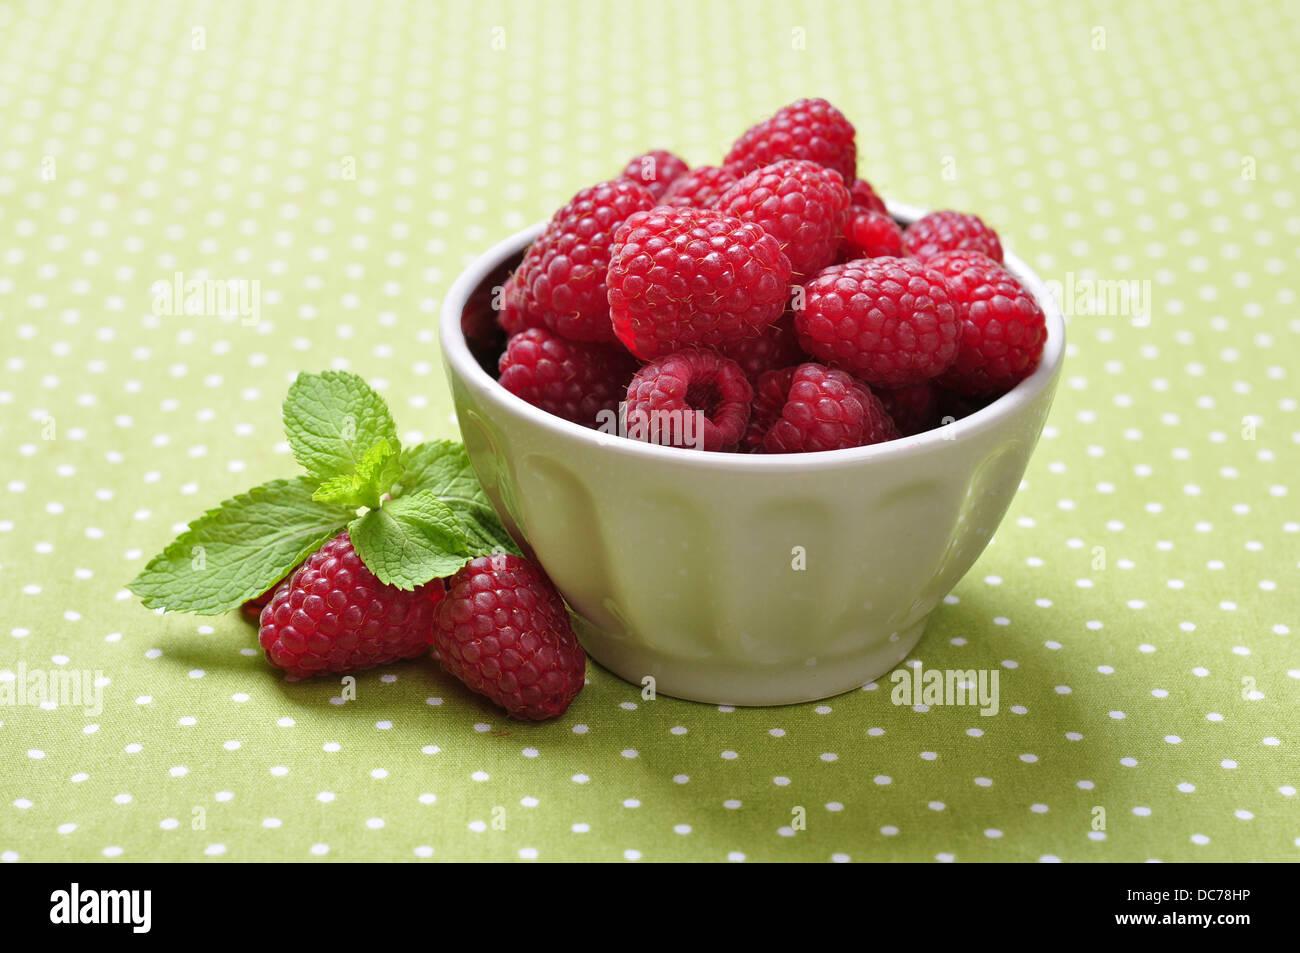 bowl of fresh raspberry on green background - Stock Image